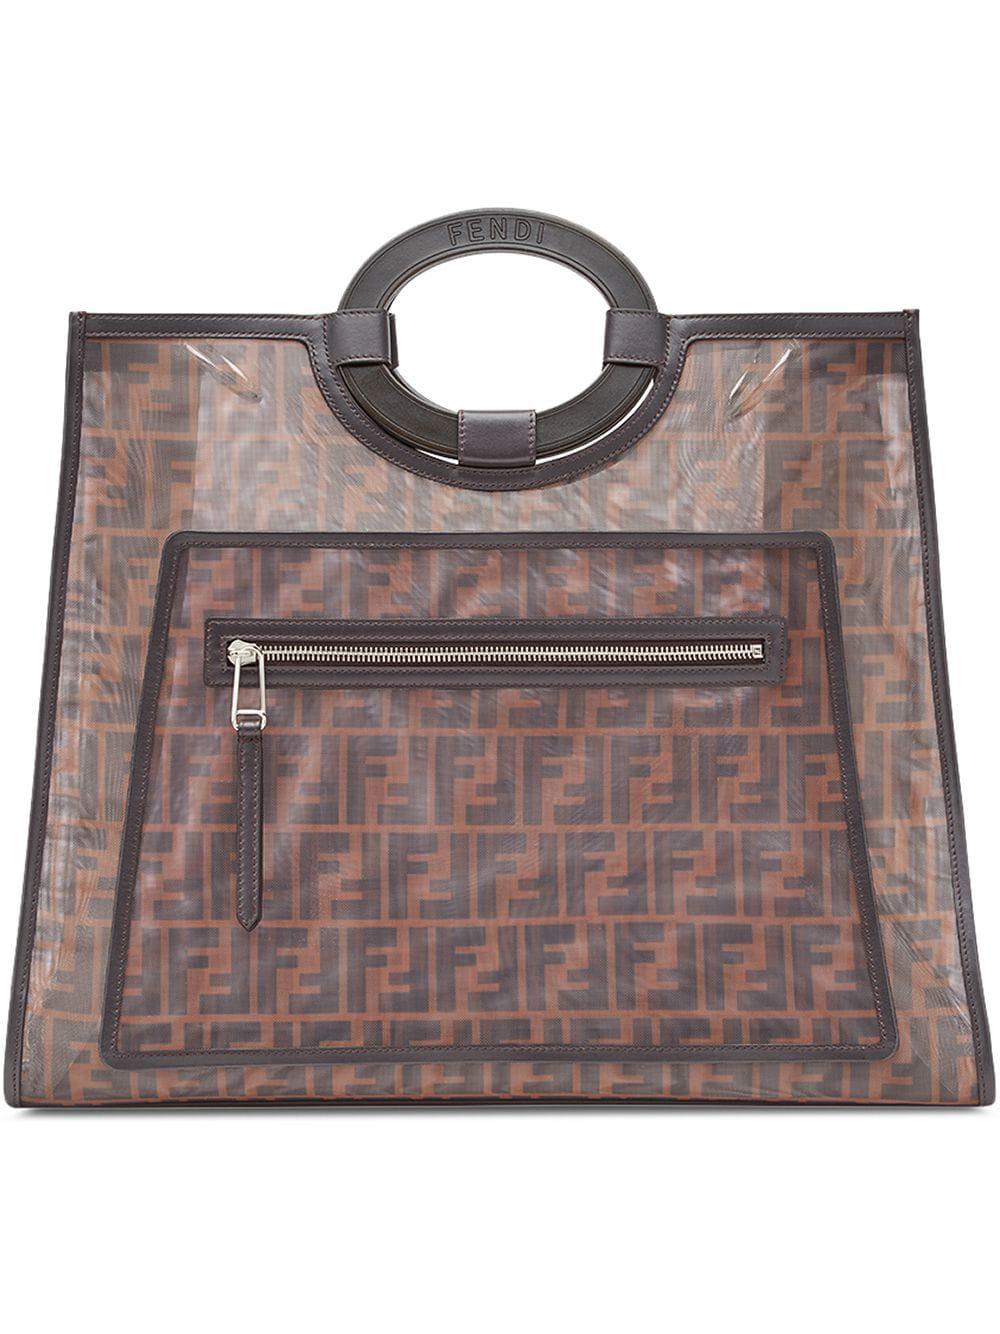 95356c1632a0 Fendi Runaway Large Leather-Trimmed Printed Mesh Tote In Dark Brown ...